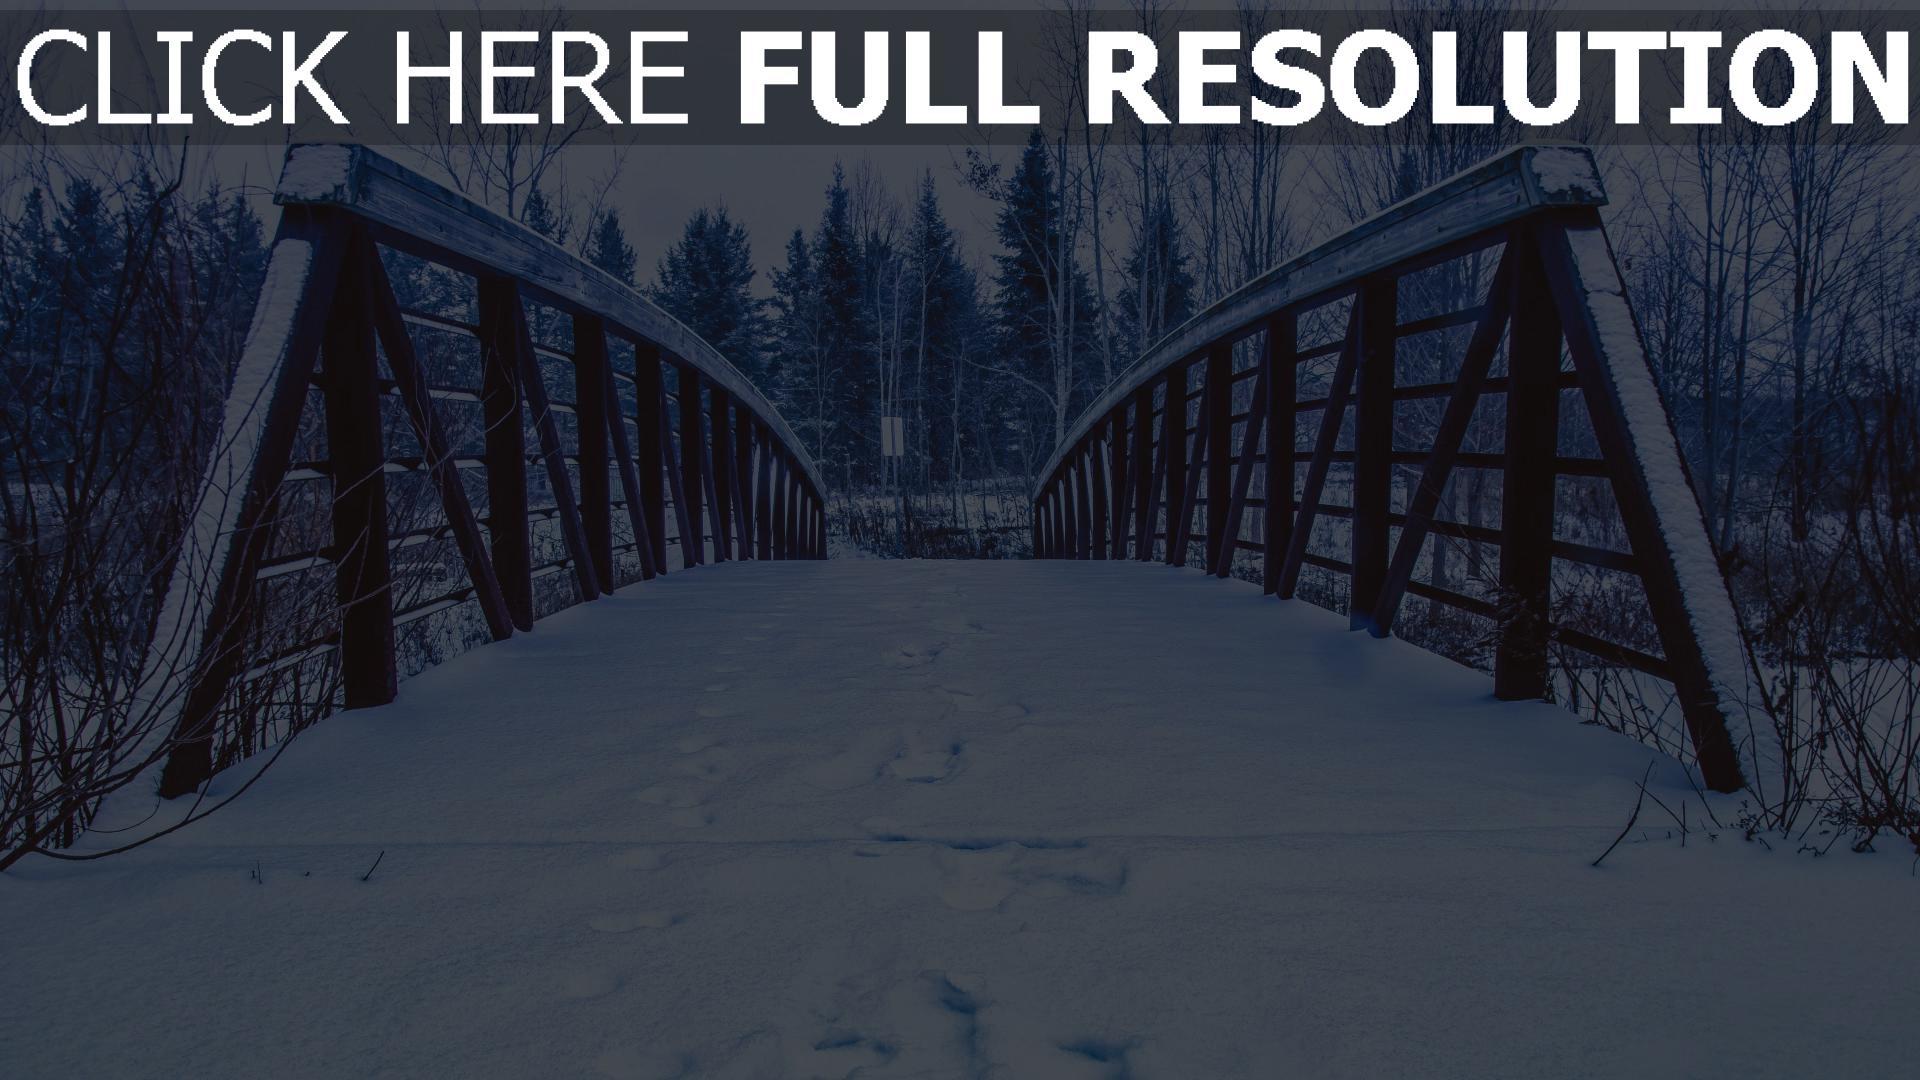 hd hintergrundbilder brücke spuren schnee winter 1920x1080